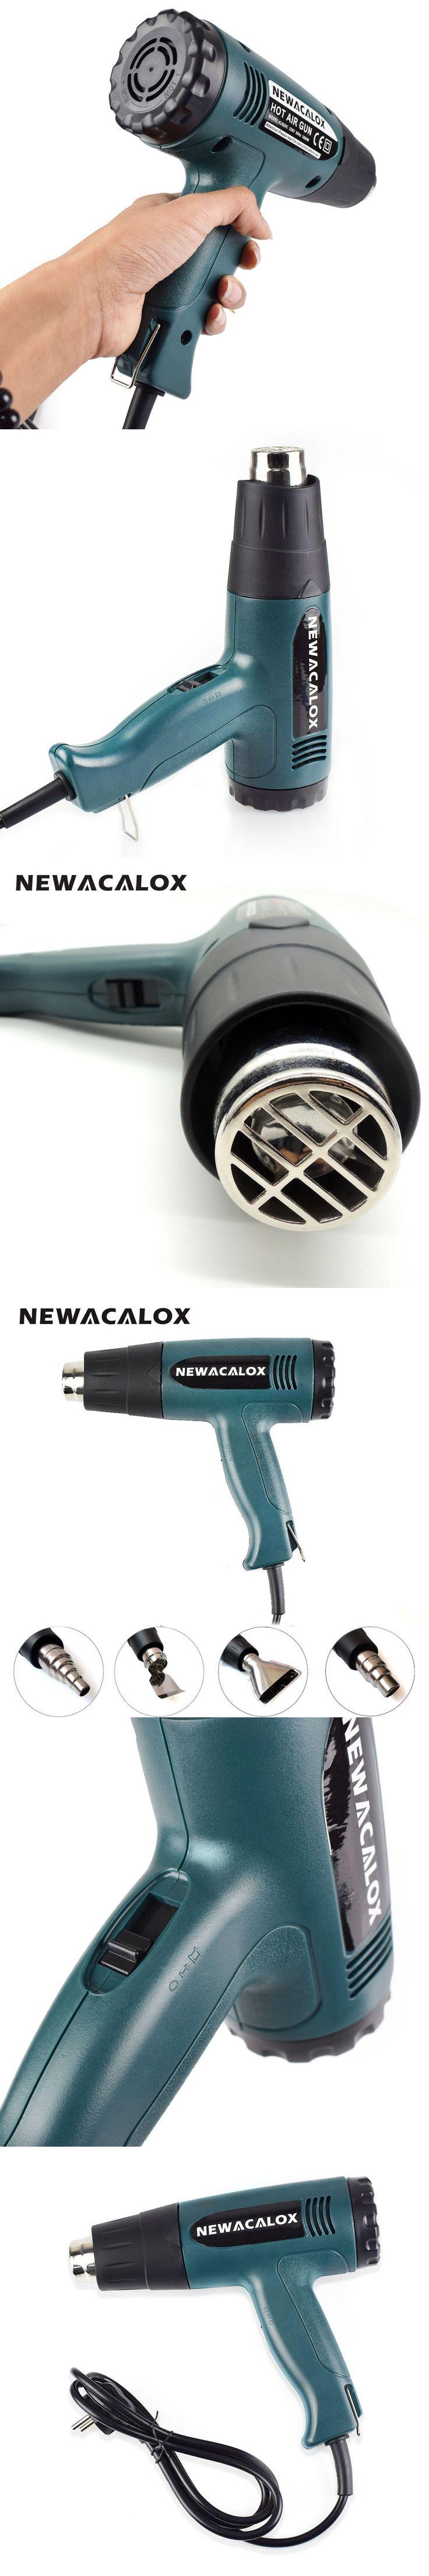 NEWACALOX 1800 Watt 220V EU Plug Industrial Electric Hot Air Gun Thermoregulator Heat Gun Kit Professional Heatguns Shrink Wrap